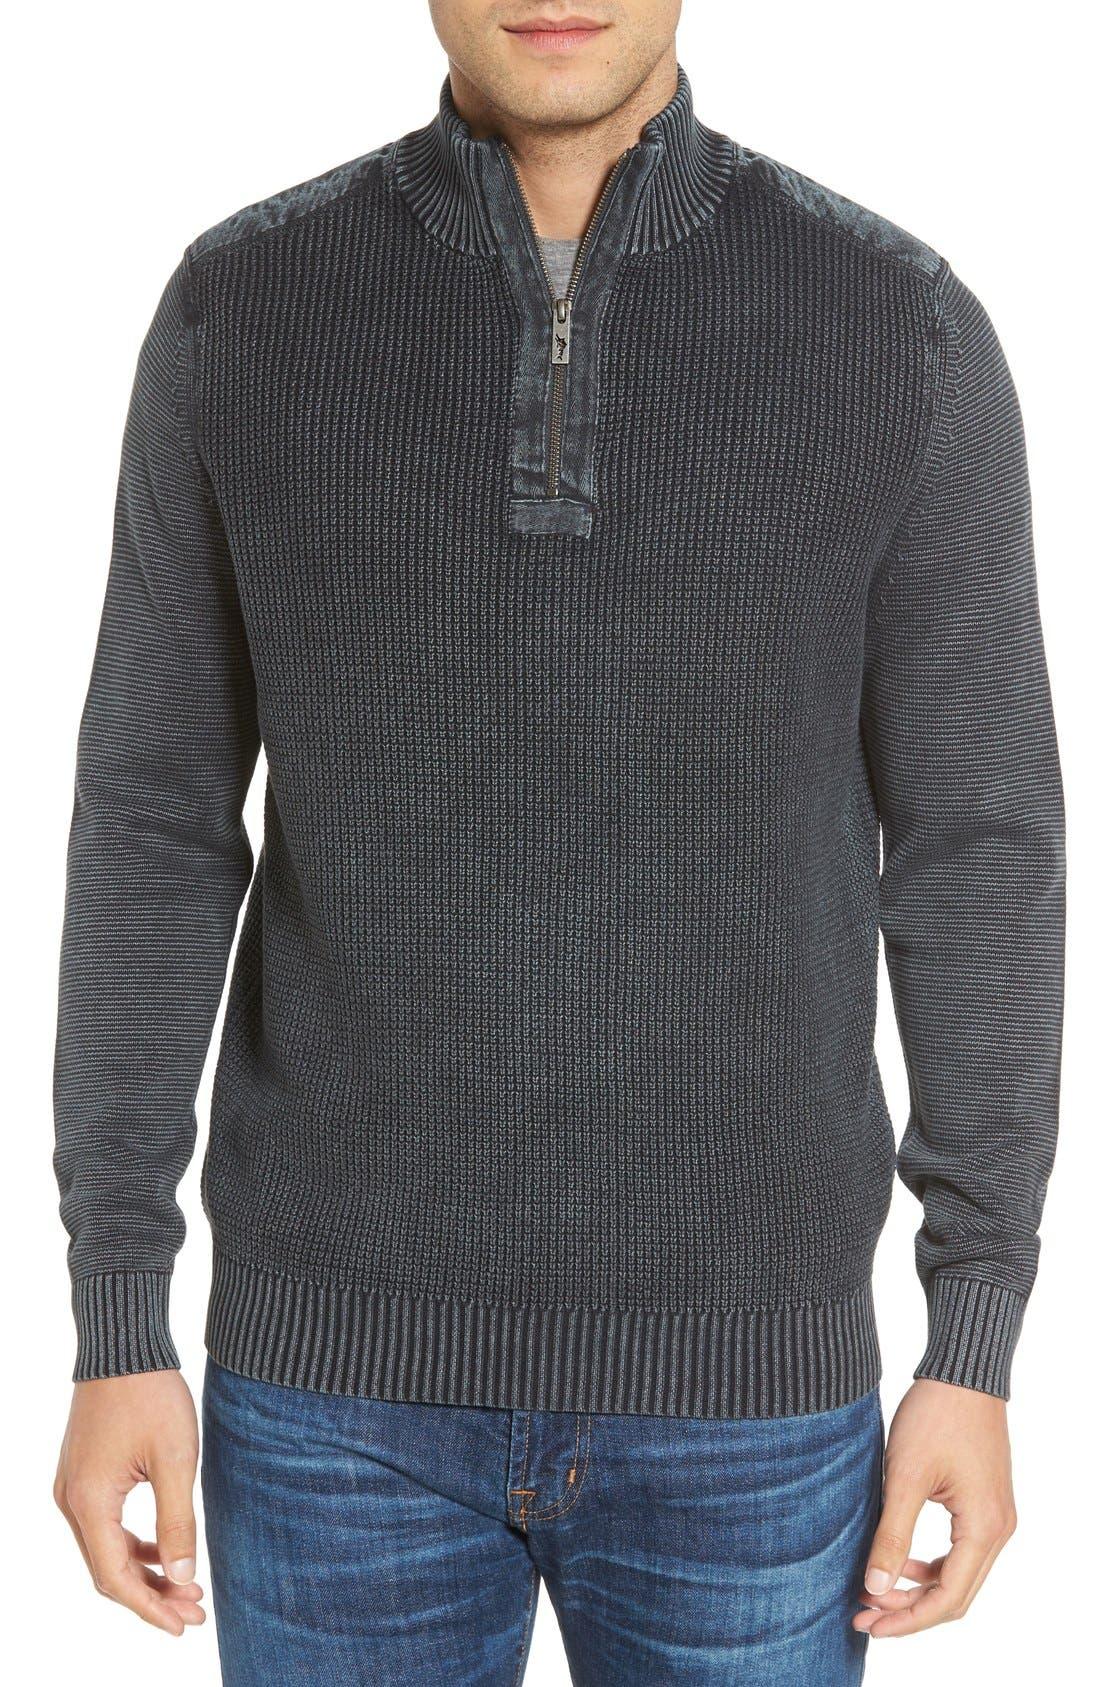 'Coastal Shores' Quarter Zip Sweater,                             Main thumbnail 3, color,